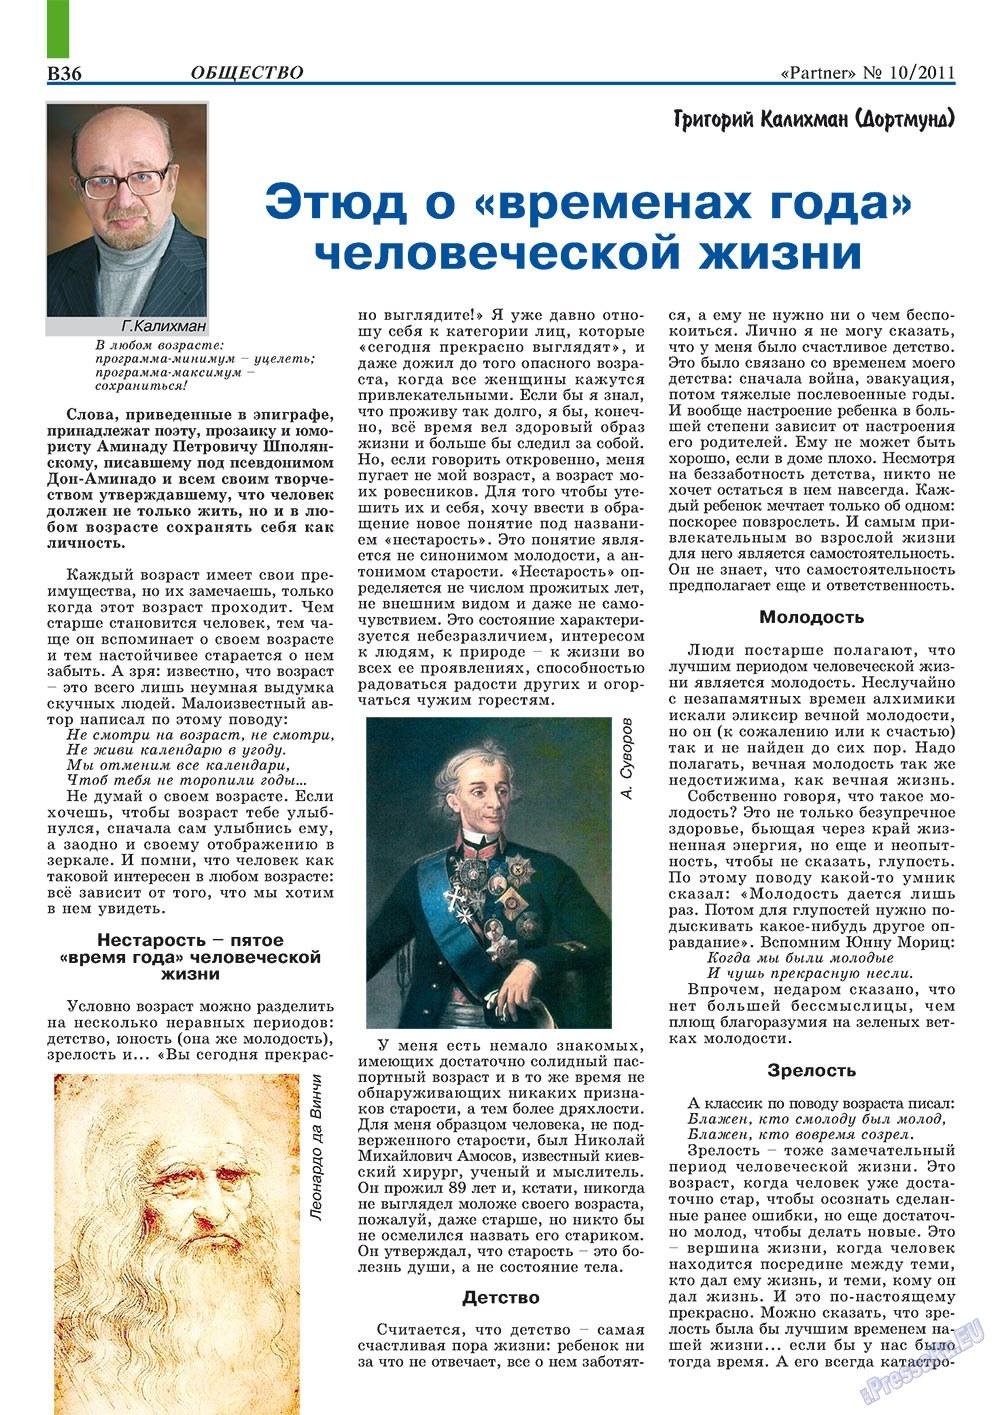 Партнер-север (журнал). 2011 год, номер 10, стр. 46